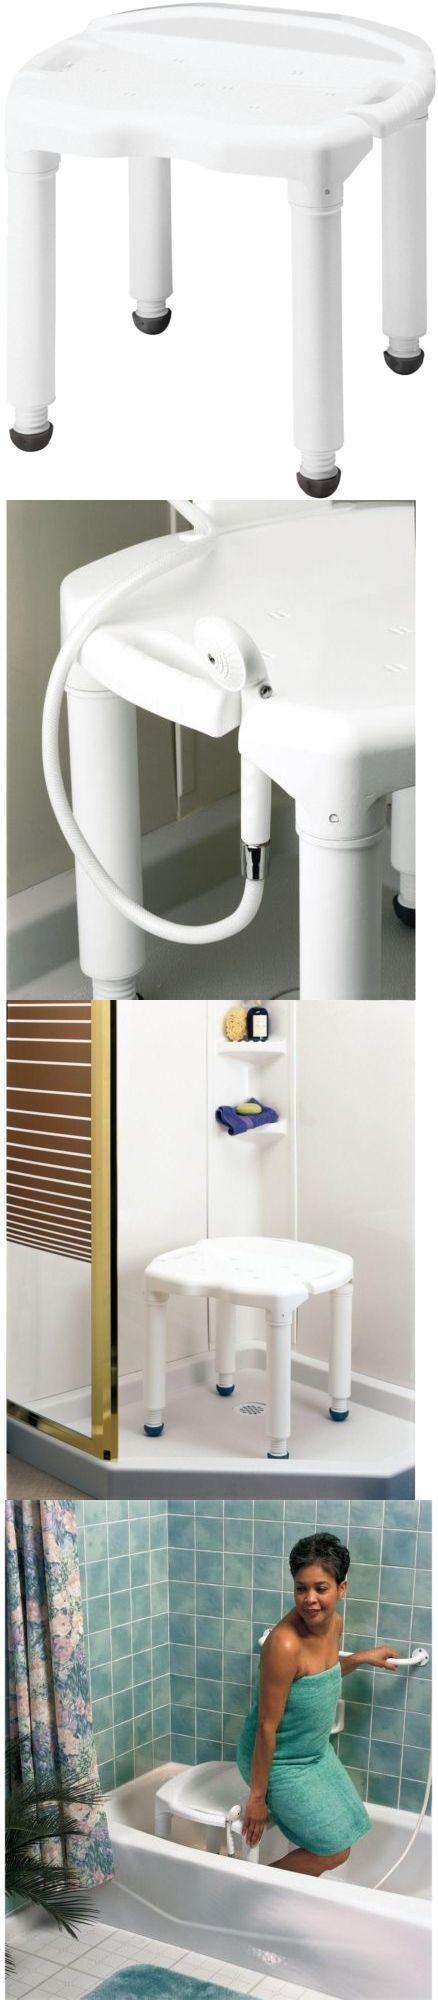 Shower and Bath Seats  Bathroom Chair Shower Bath Tub Bench Seat Adjustable Height Freestanding White. Shower and Bath Seats  Bathroom Chair Shower Bath Tub Bench Seat